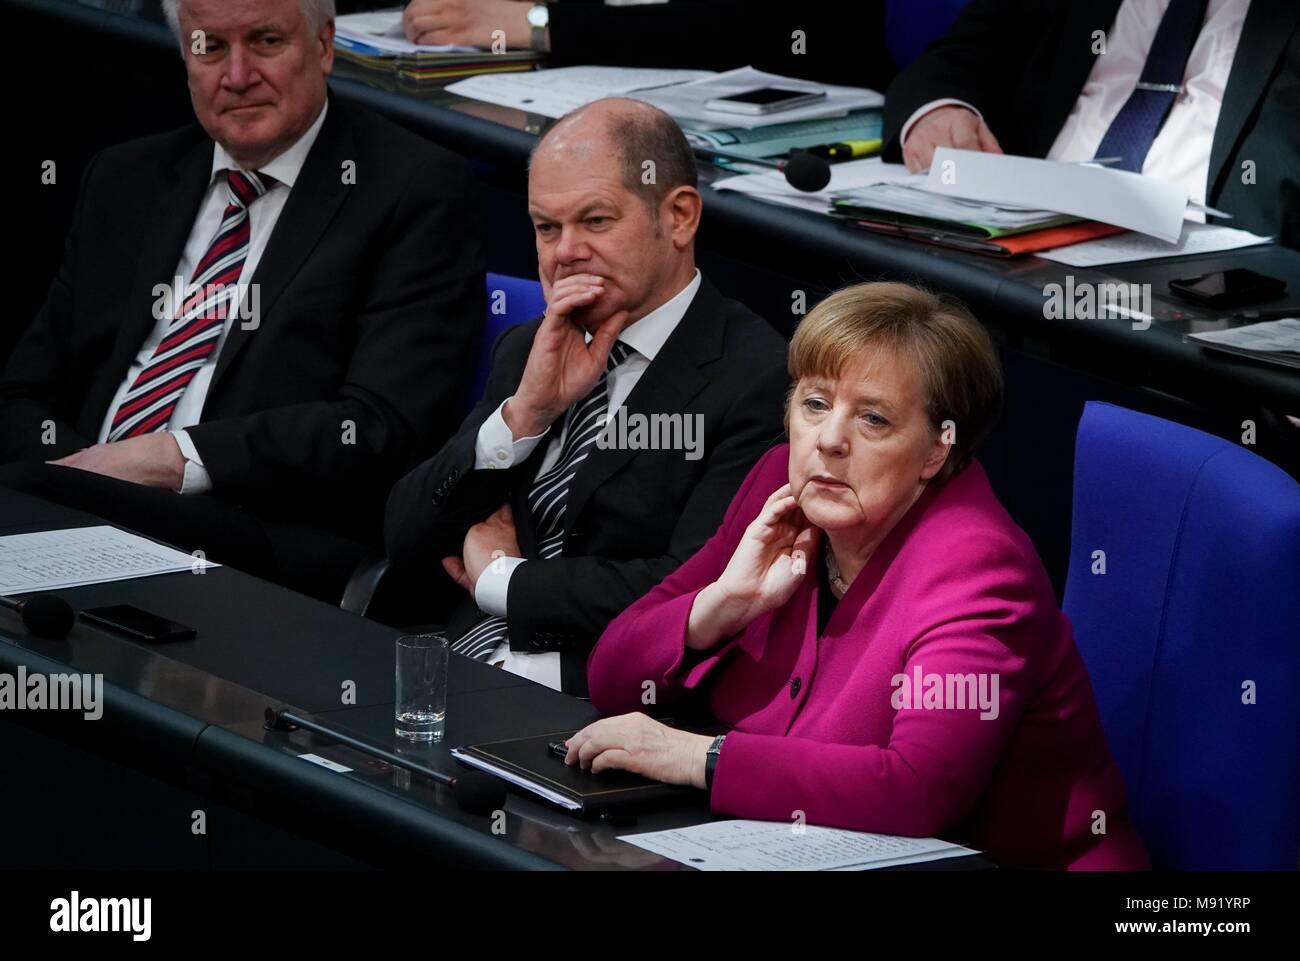 German Olaf Scholz Stockfotos & German Olaf Scholz Bilder Seite 6